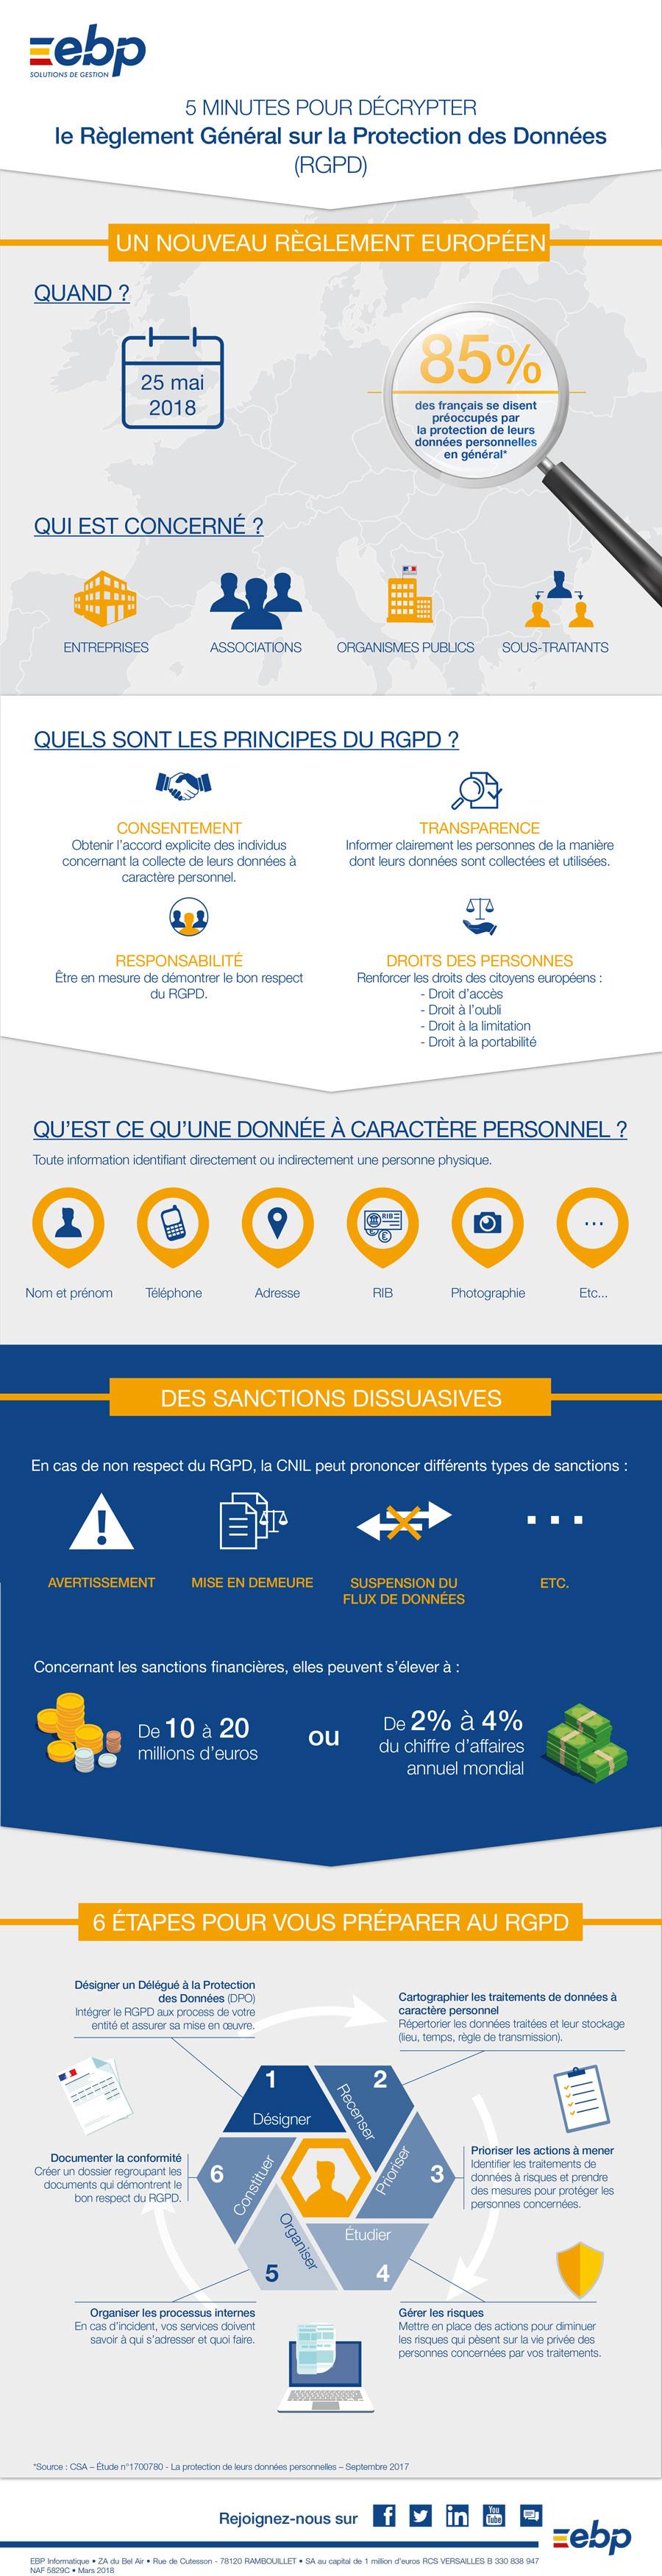 ebp-infographie-rgpd